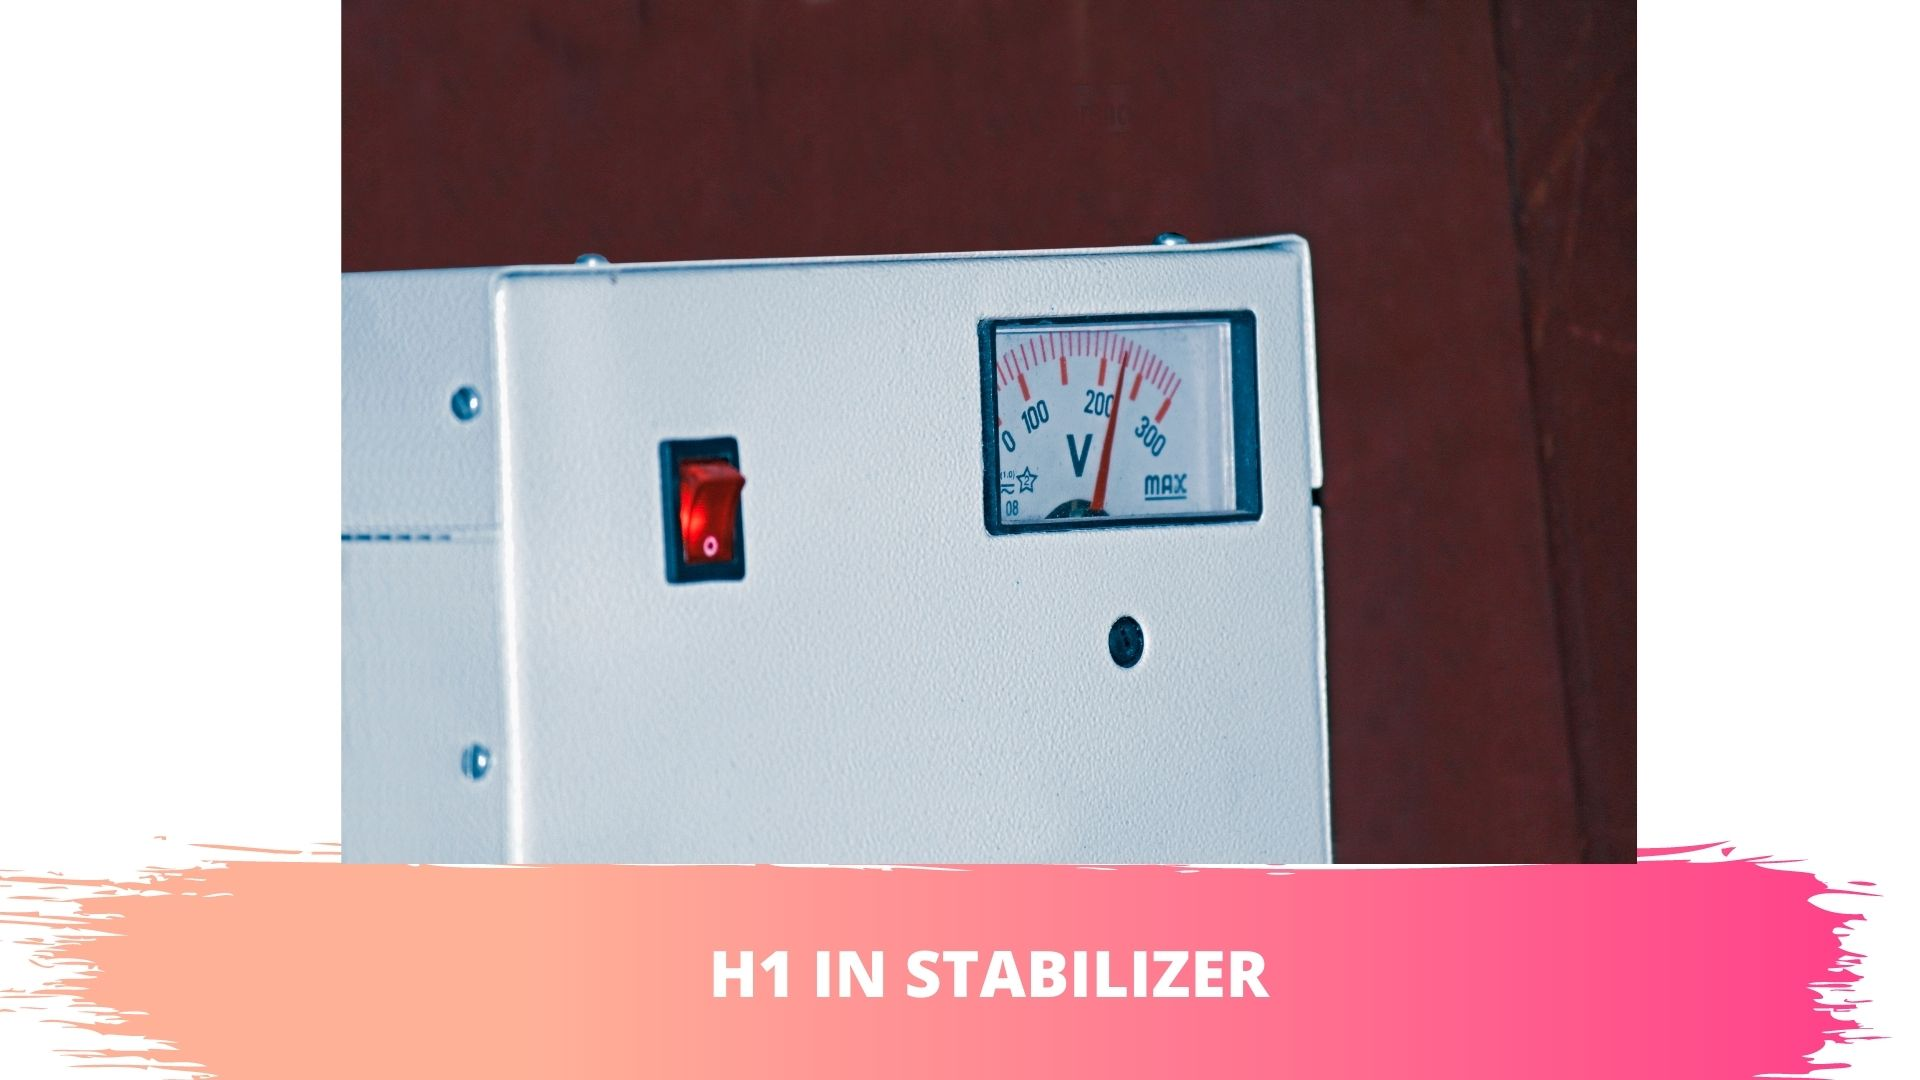 h1 in stabilizer